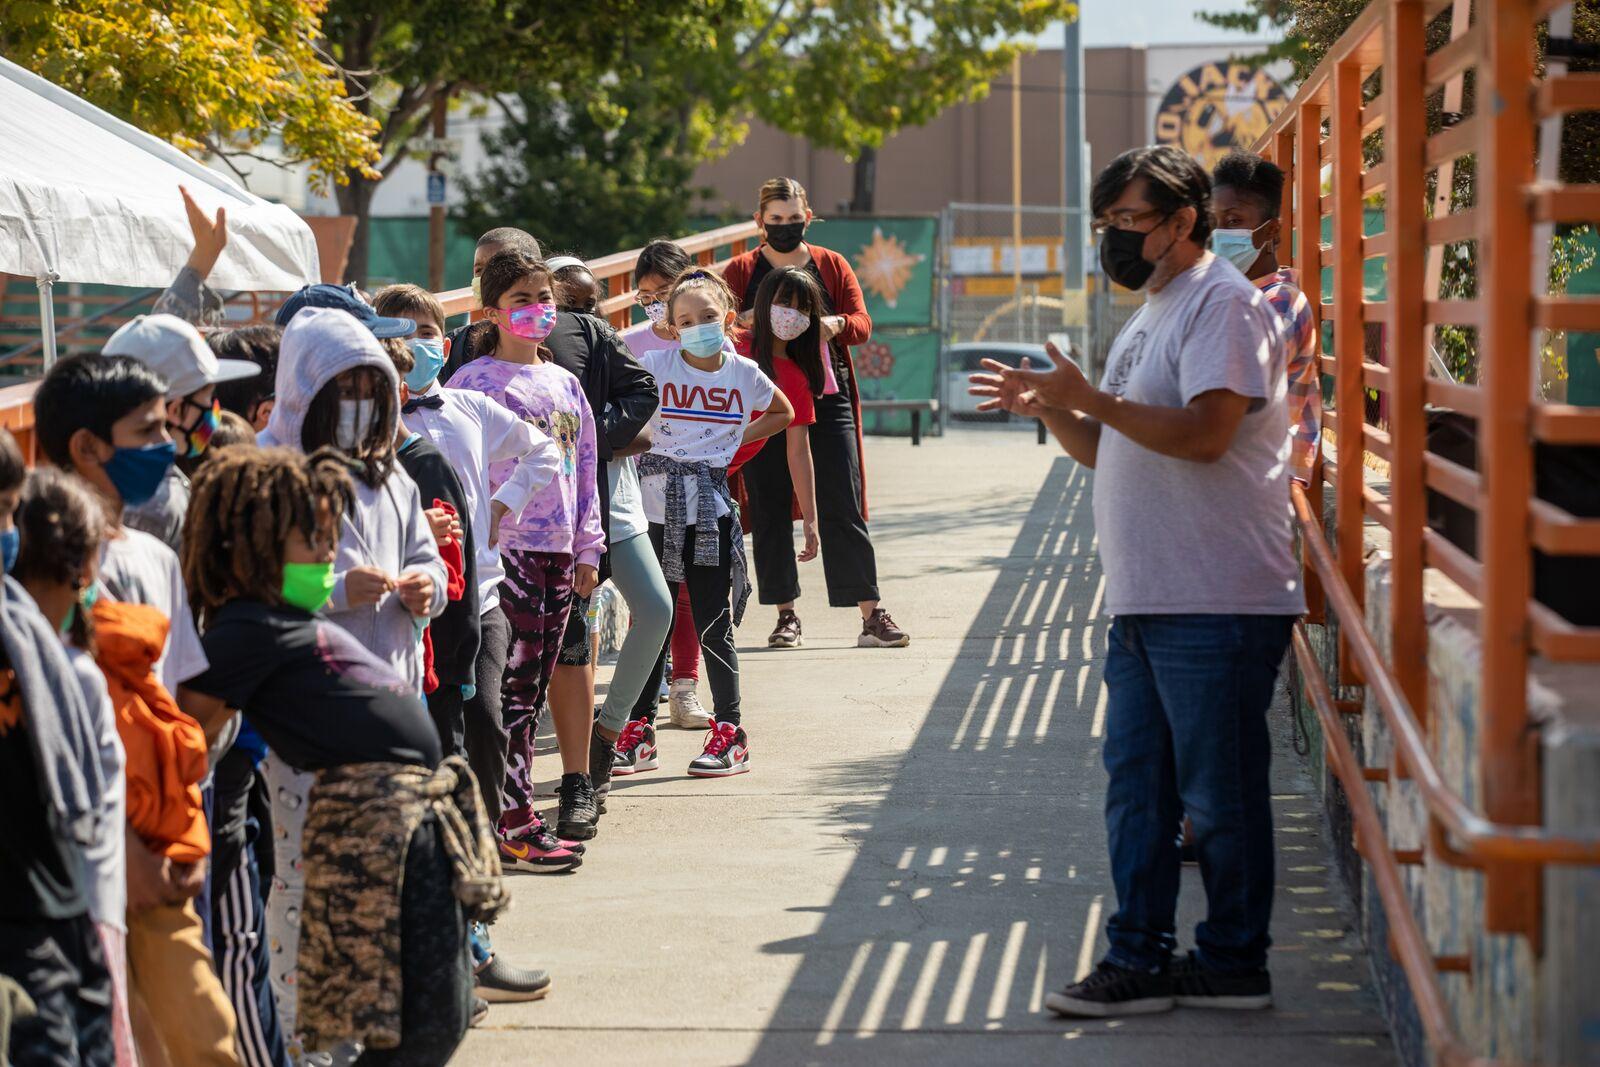 Washington Elementary School 4th grade teacher Oscar Zarate instructs students in physical education on August 16, 2021. Credit: Kelly Sullivan